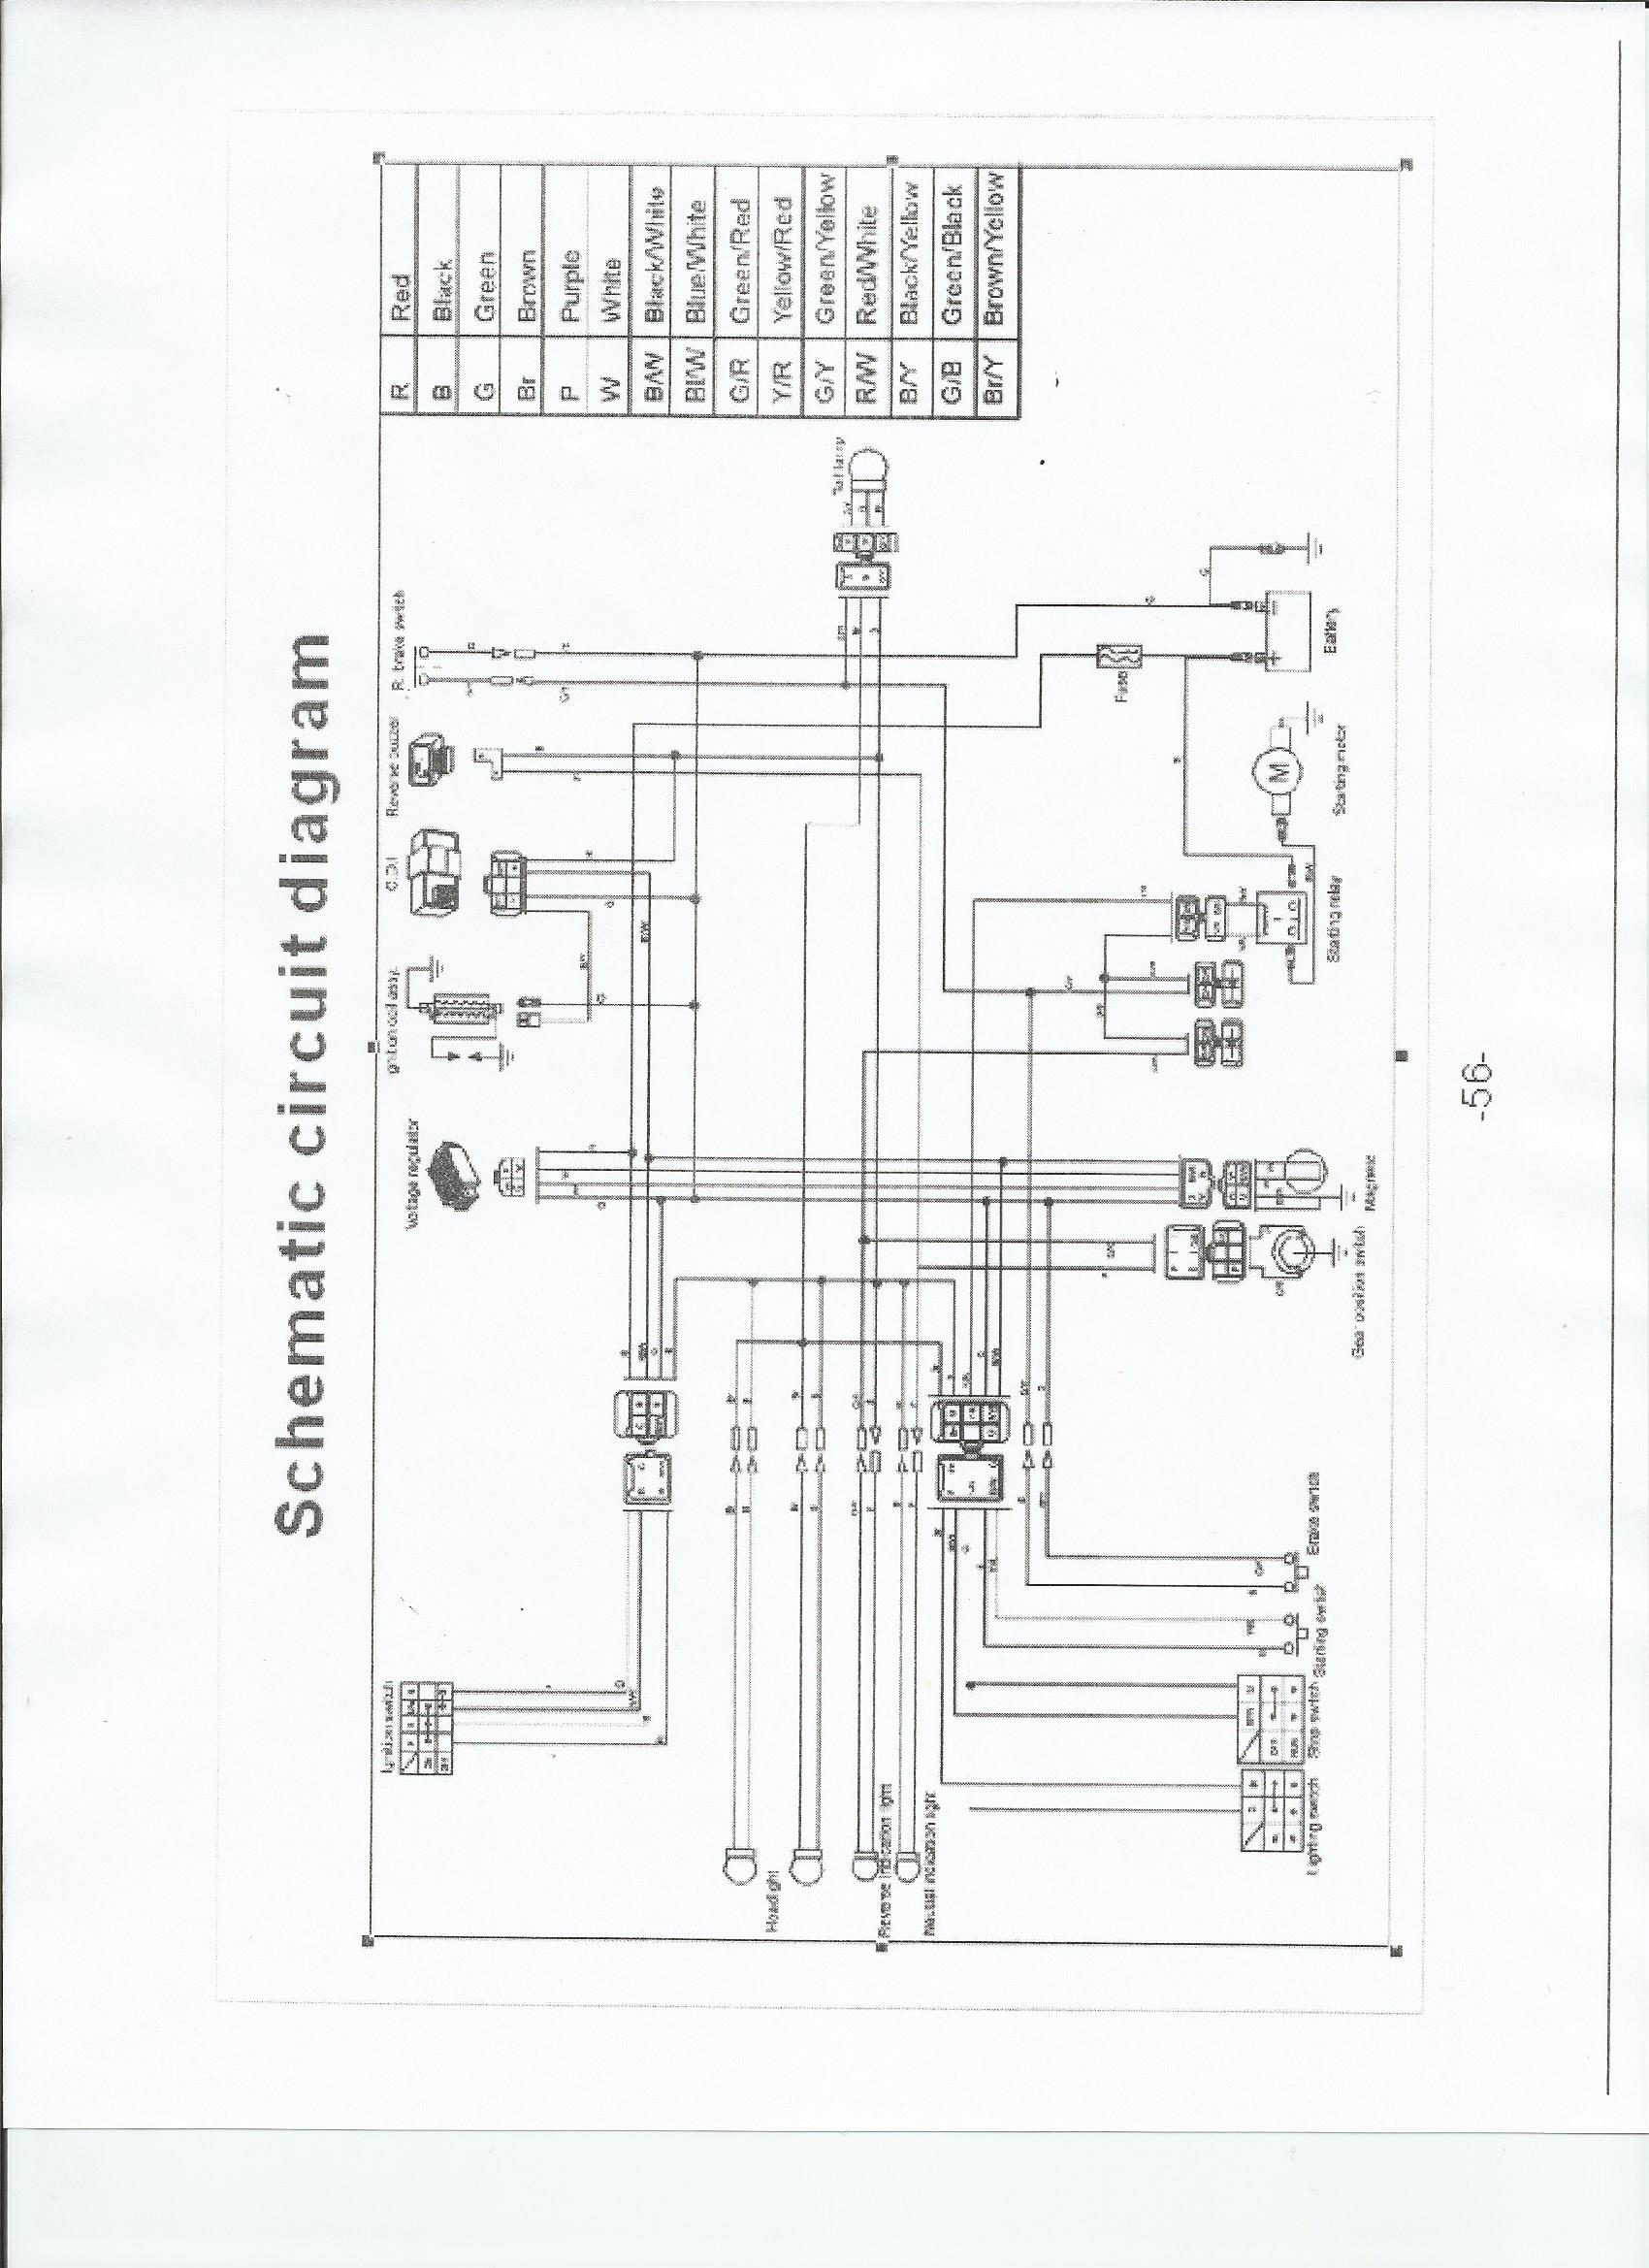 tao tao wiring harness schematics wiring diagrams u2022 rh senioren umzug com